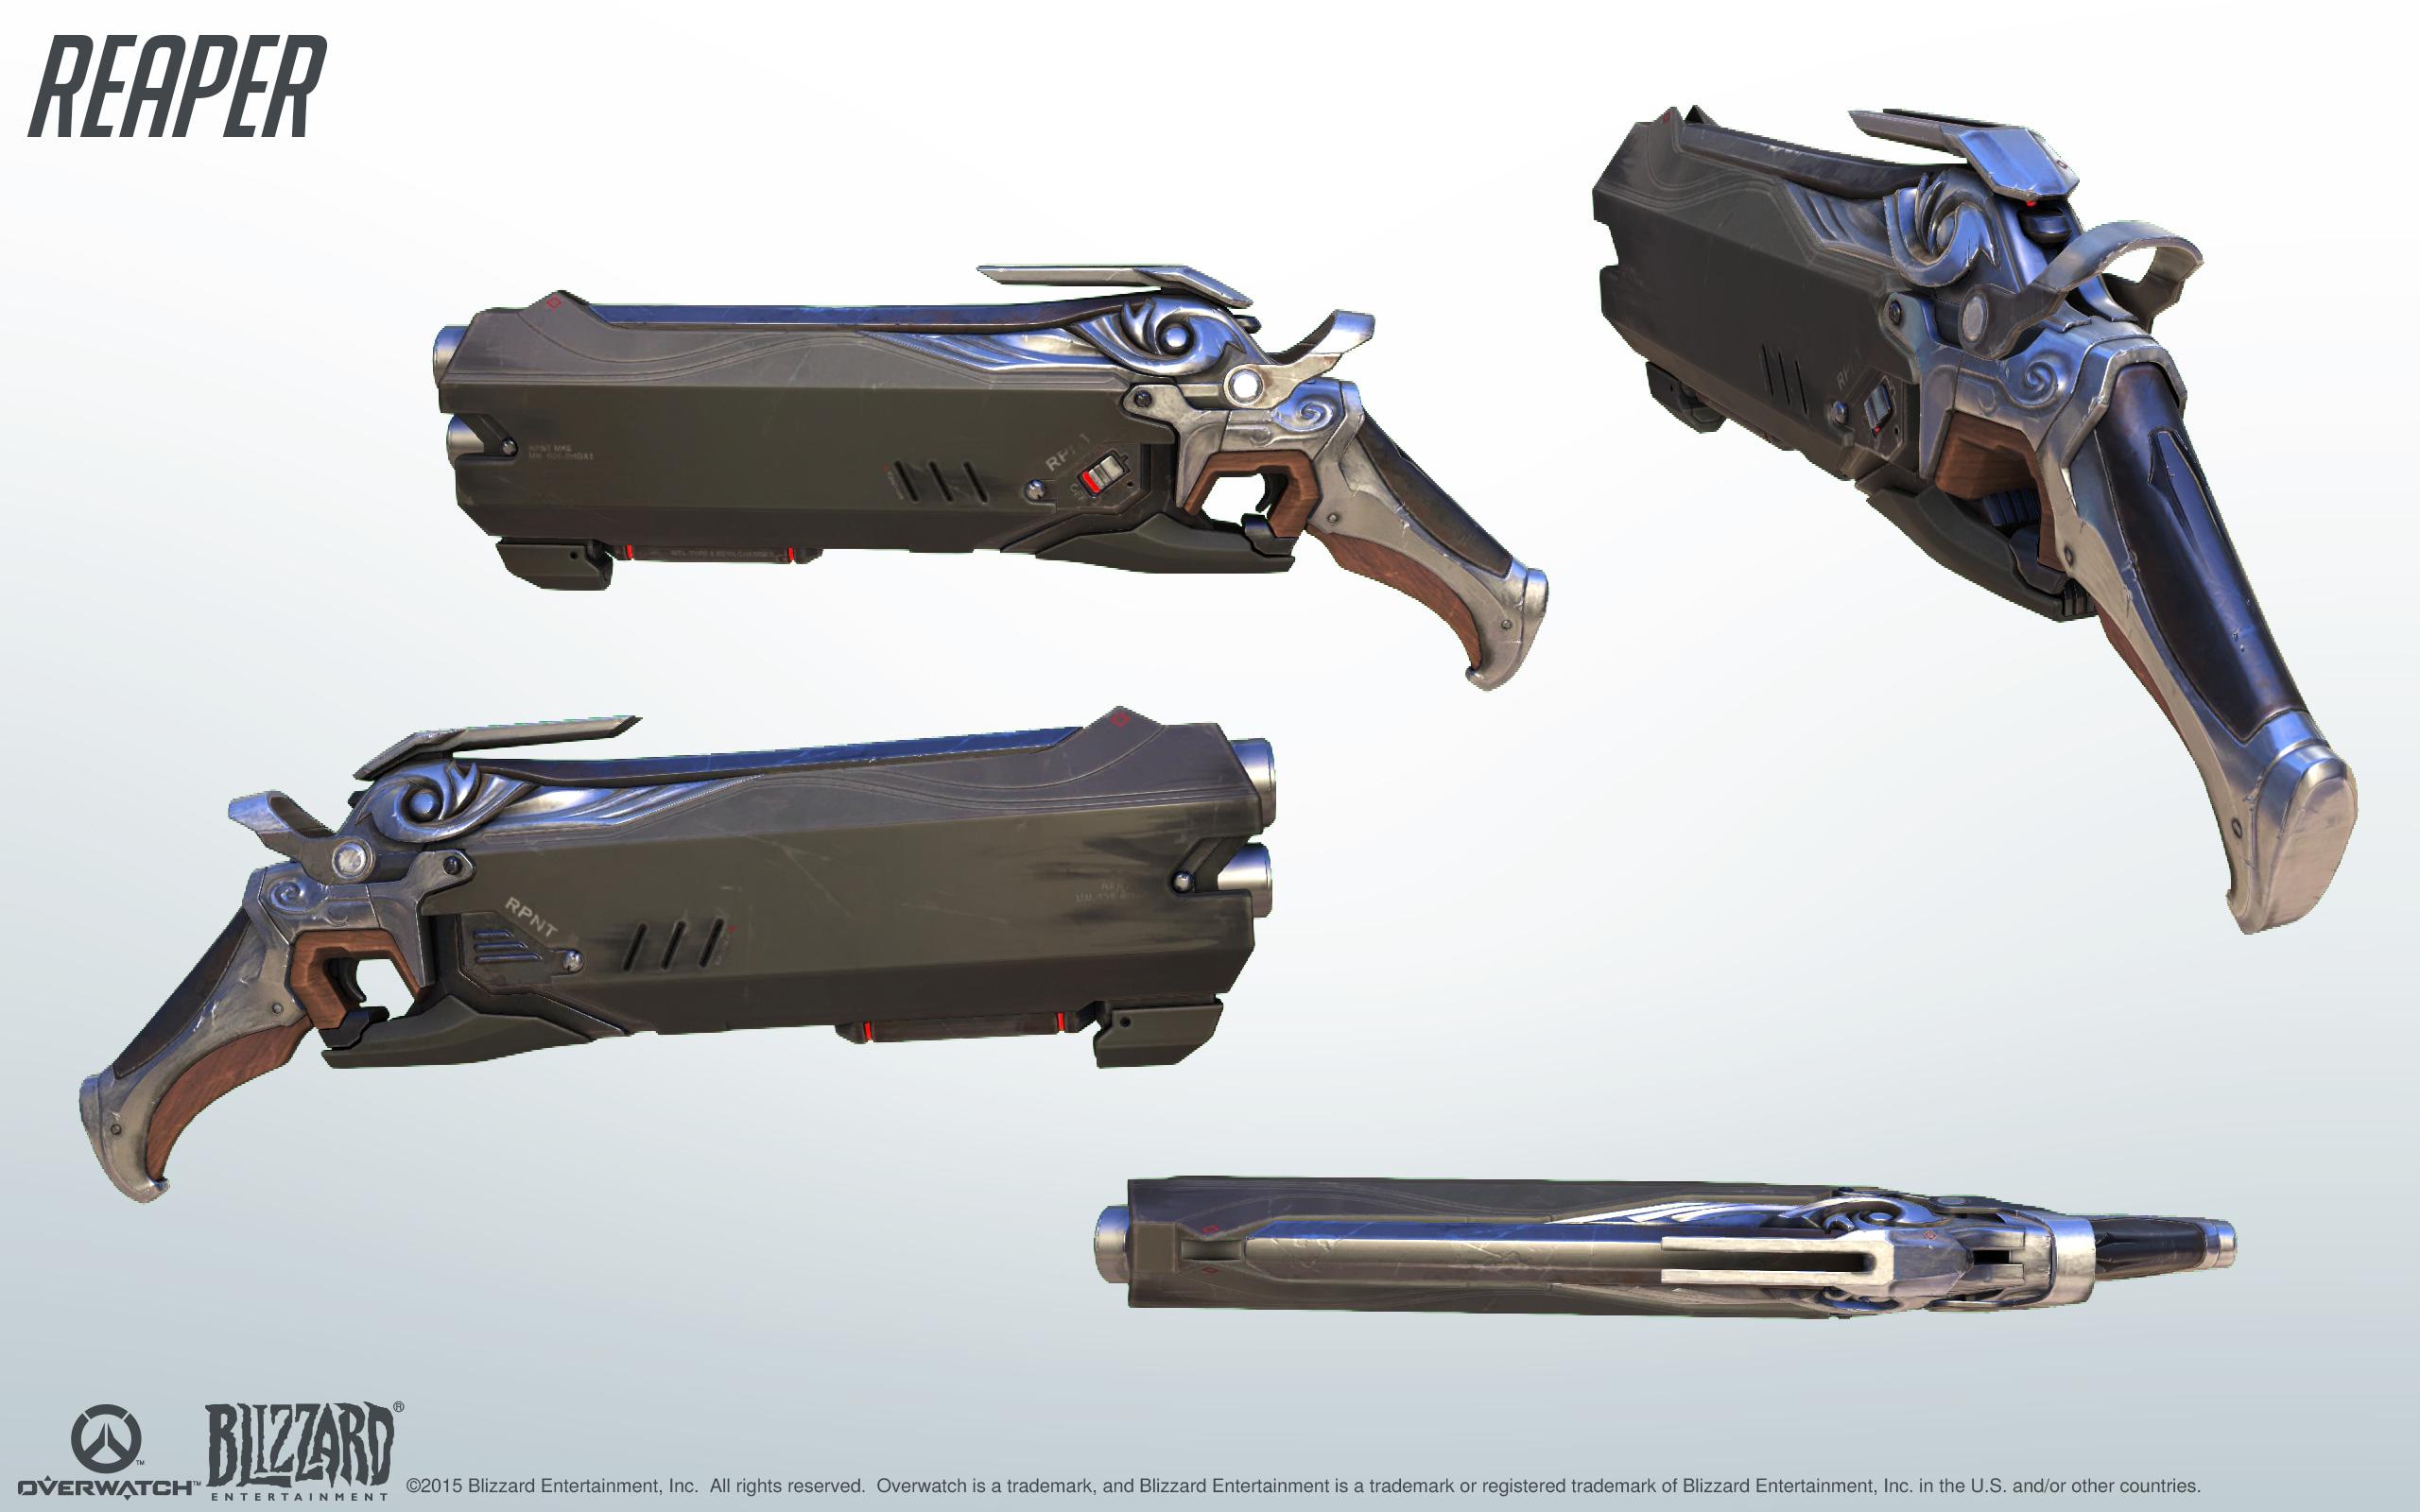 Overwatch OW Reaper Gabriel Reyes Mariachi Golden Two Guns Cosplay Weapon  Prop #overwatch #reaper #GabrielReyesMariachiGoldenTwoGuns #cosplayweapon  ...